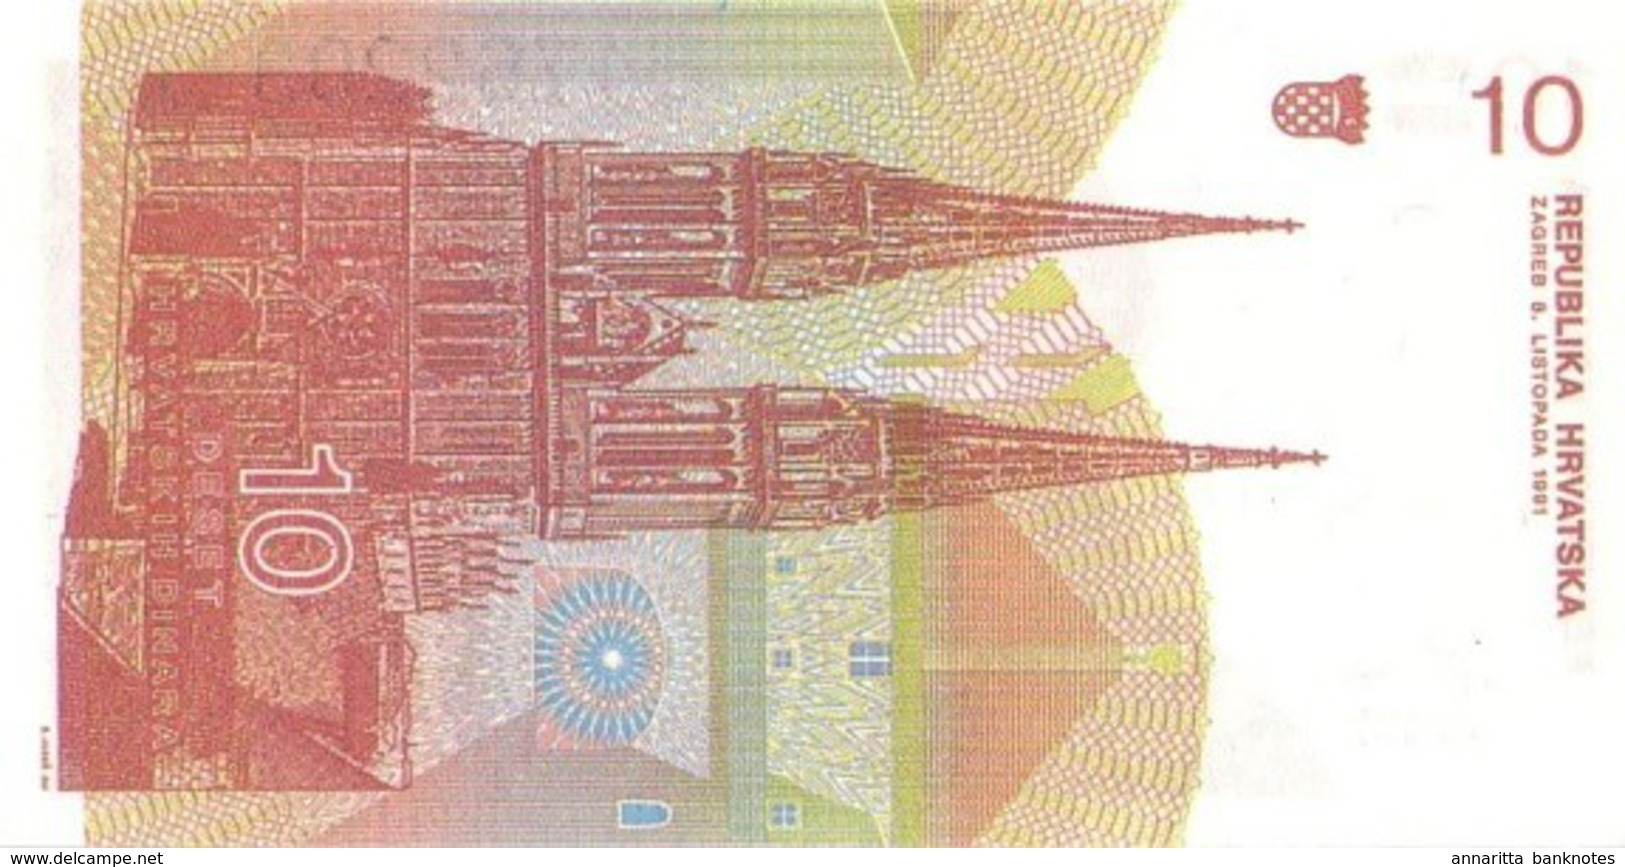 CROATIA 10 DINARS 1991 UNC [ HR303a ] - Croatia